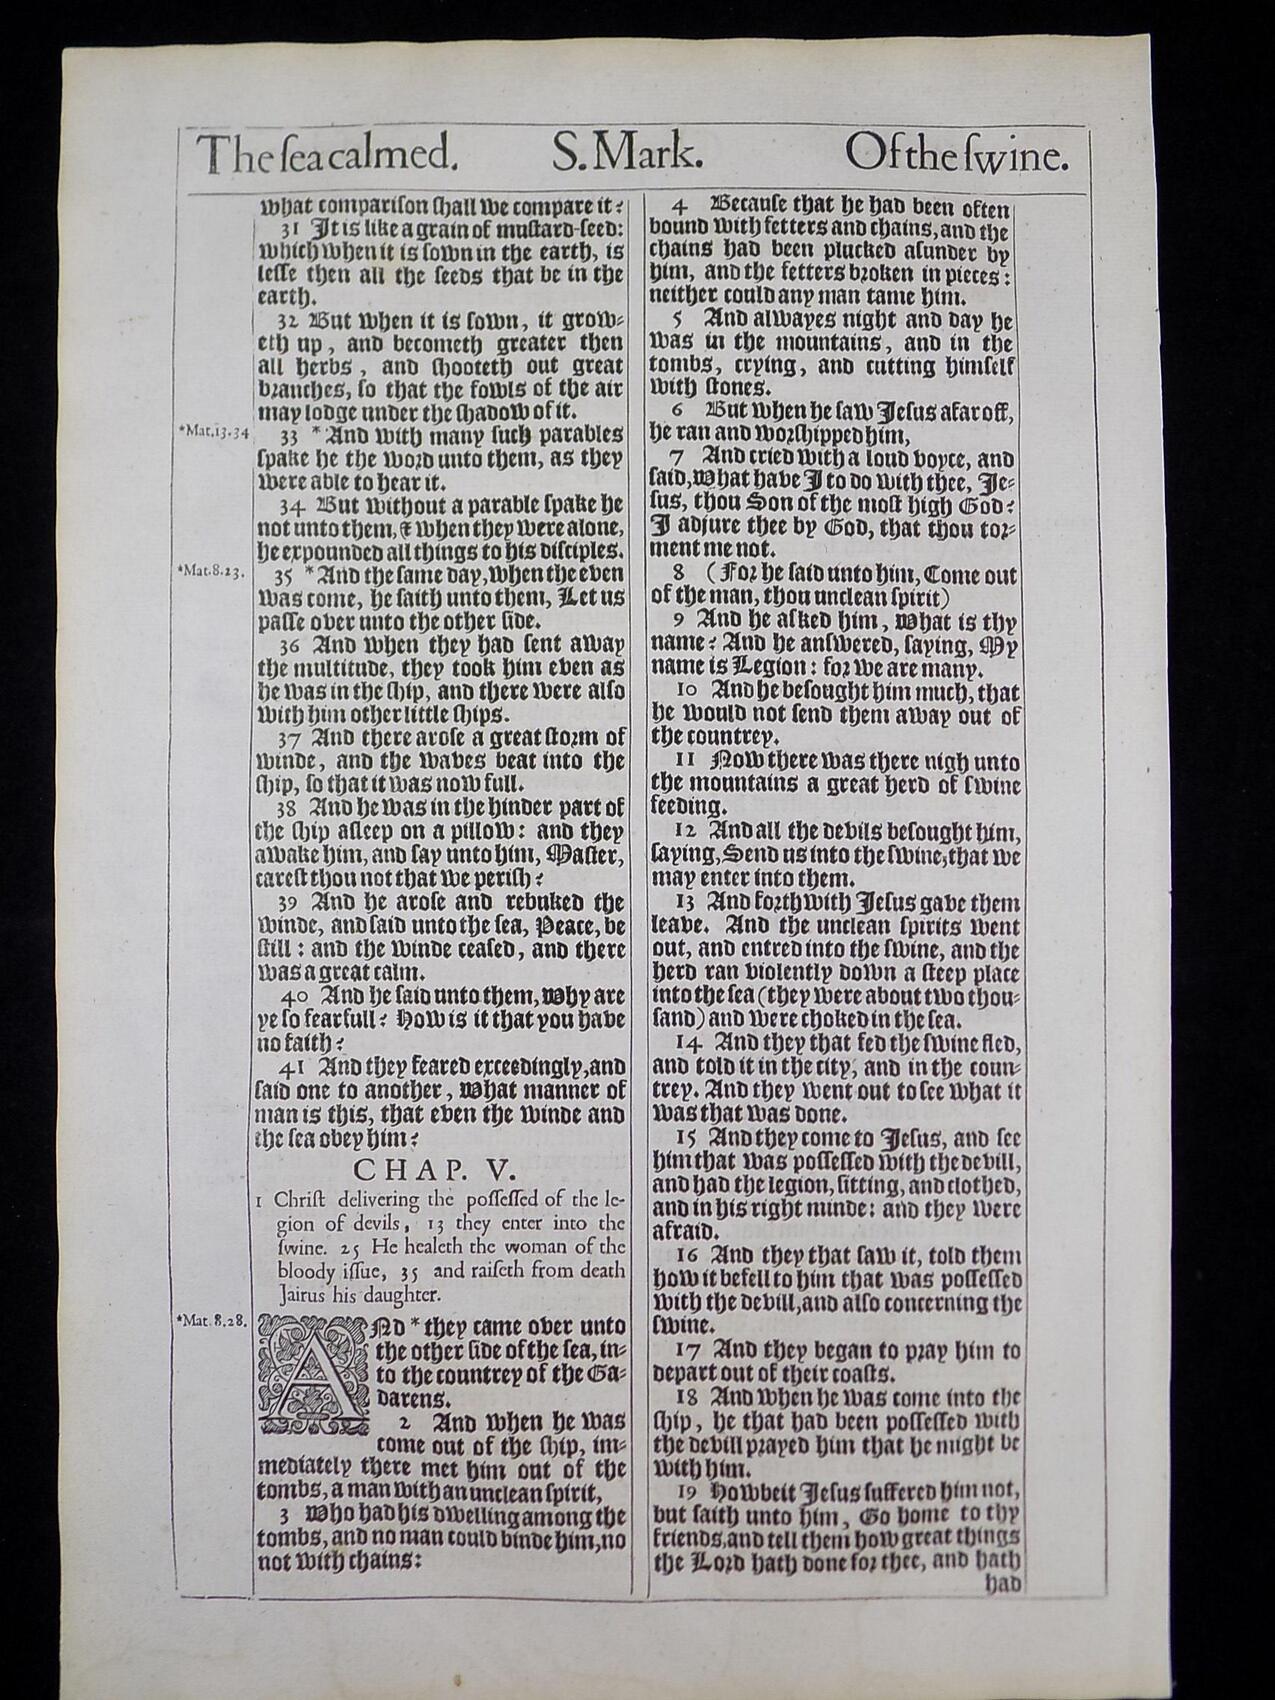 1611 KING JAMES BIBLE BOOK OF MARK ANTIQUE BIBLE